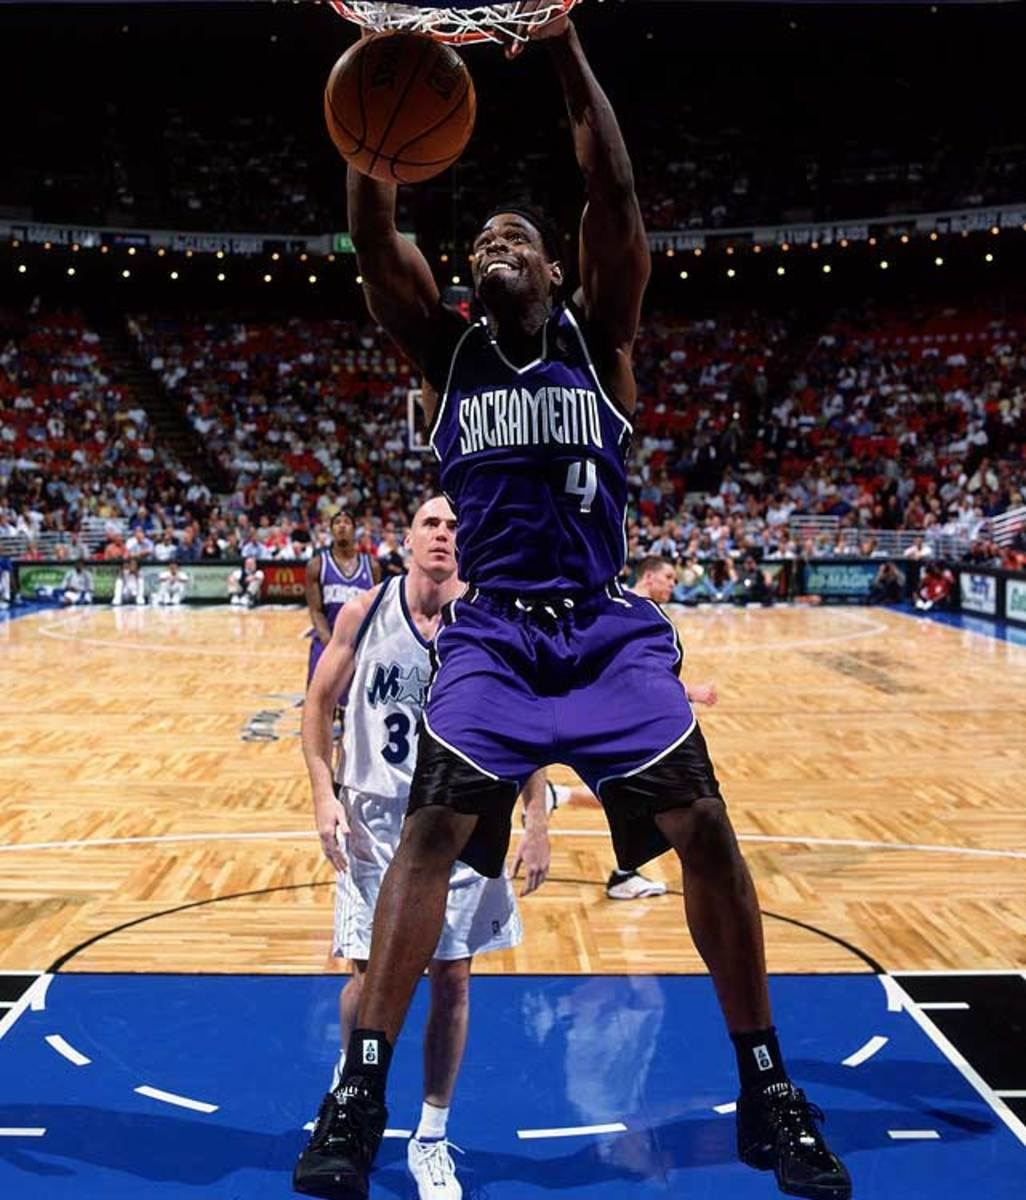 1993: Chris Webber